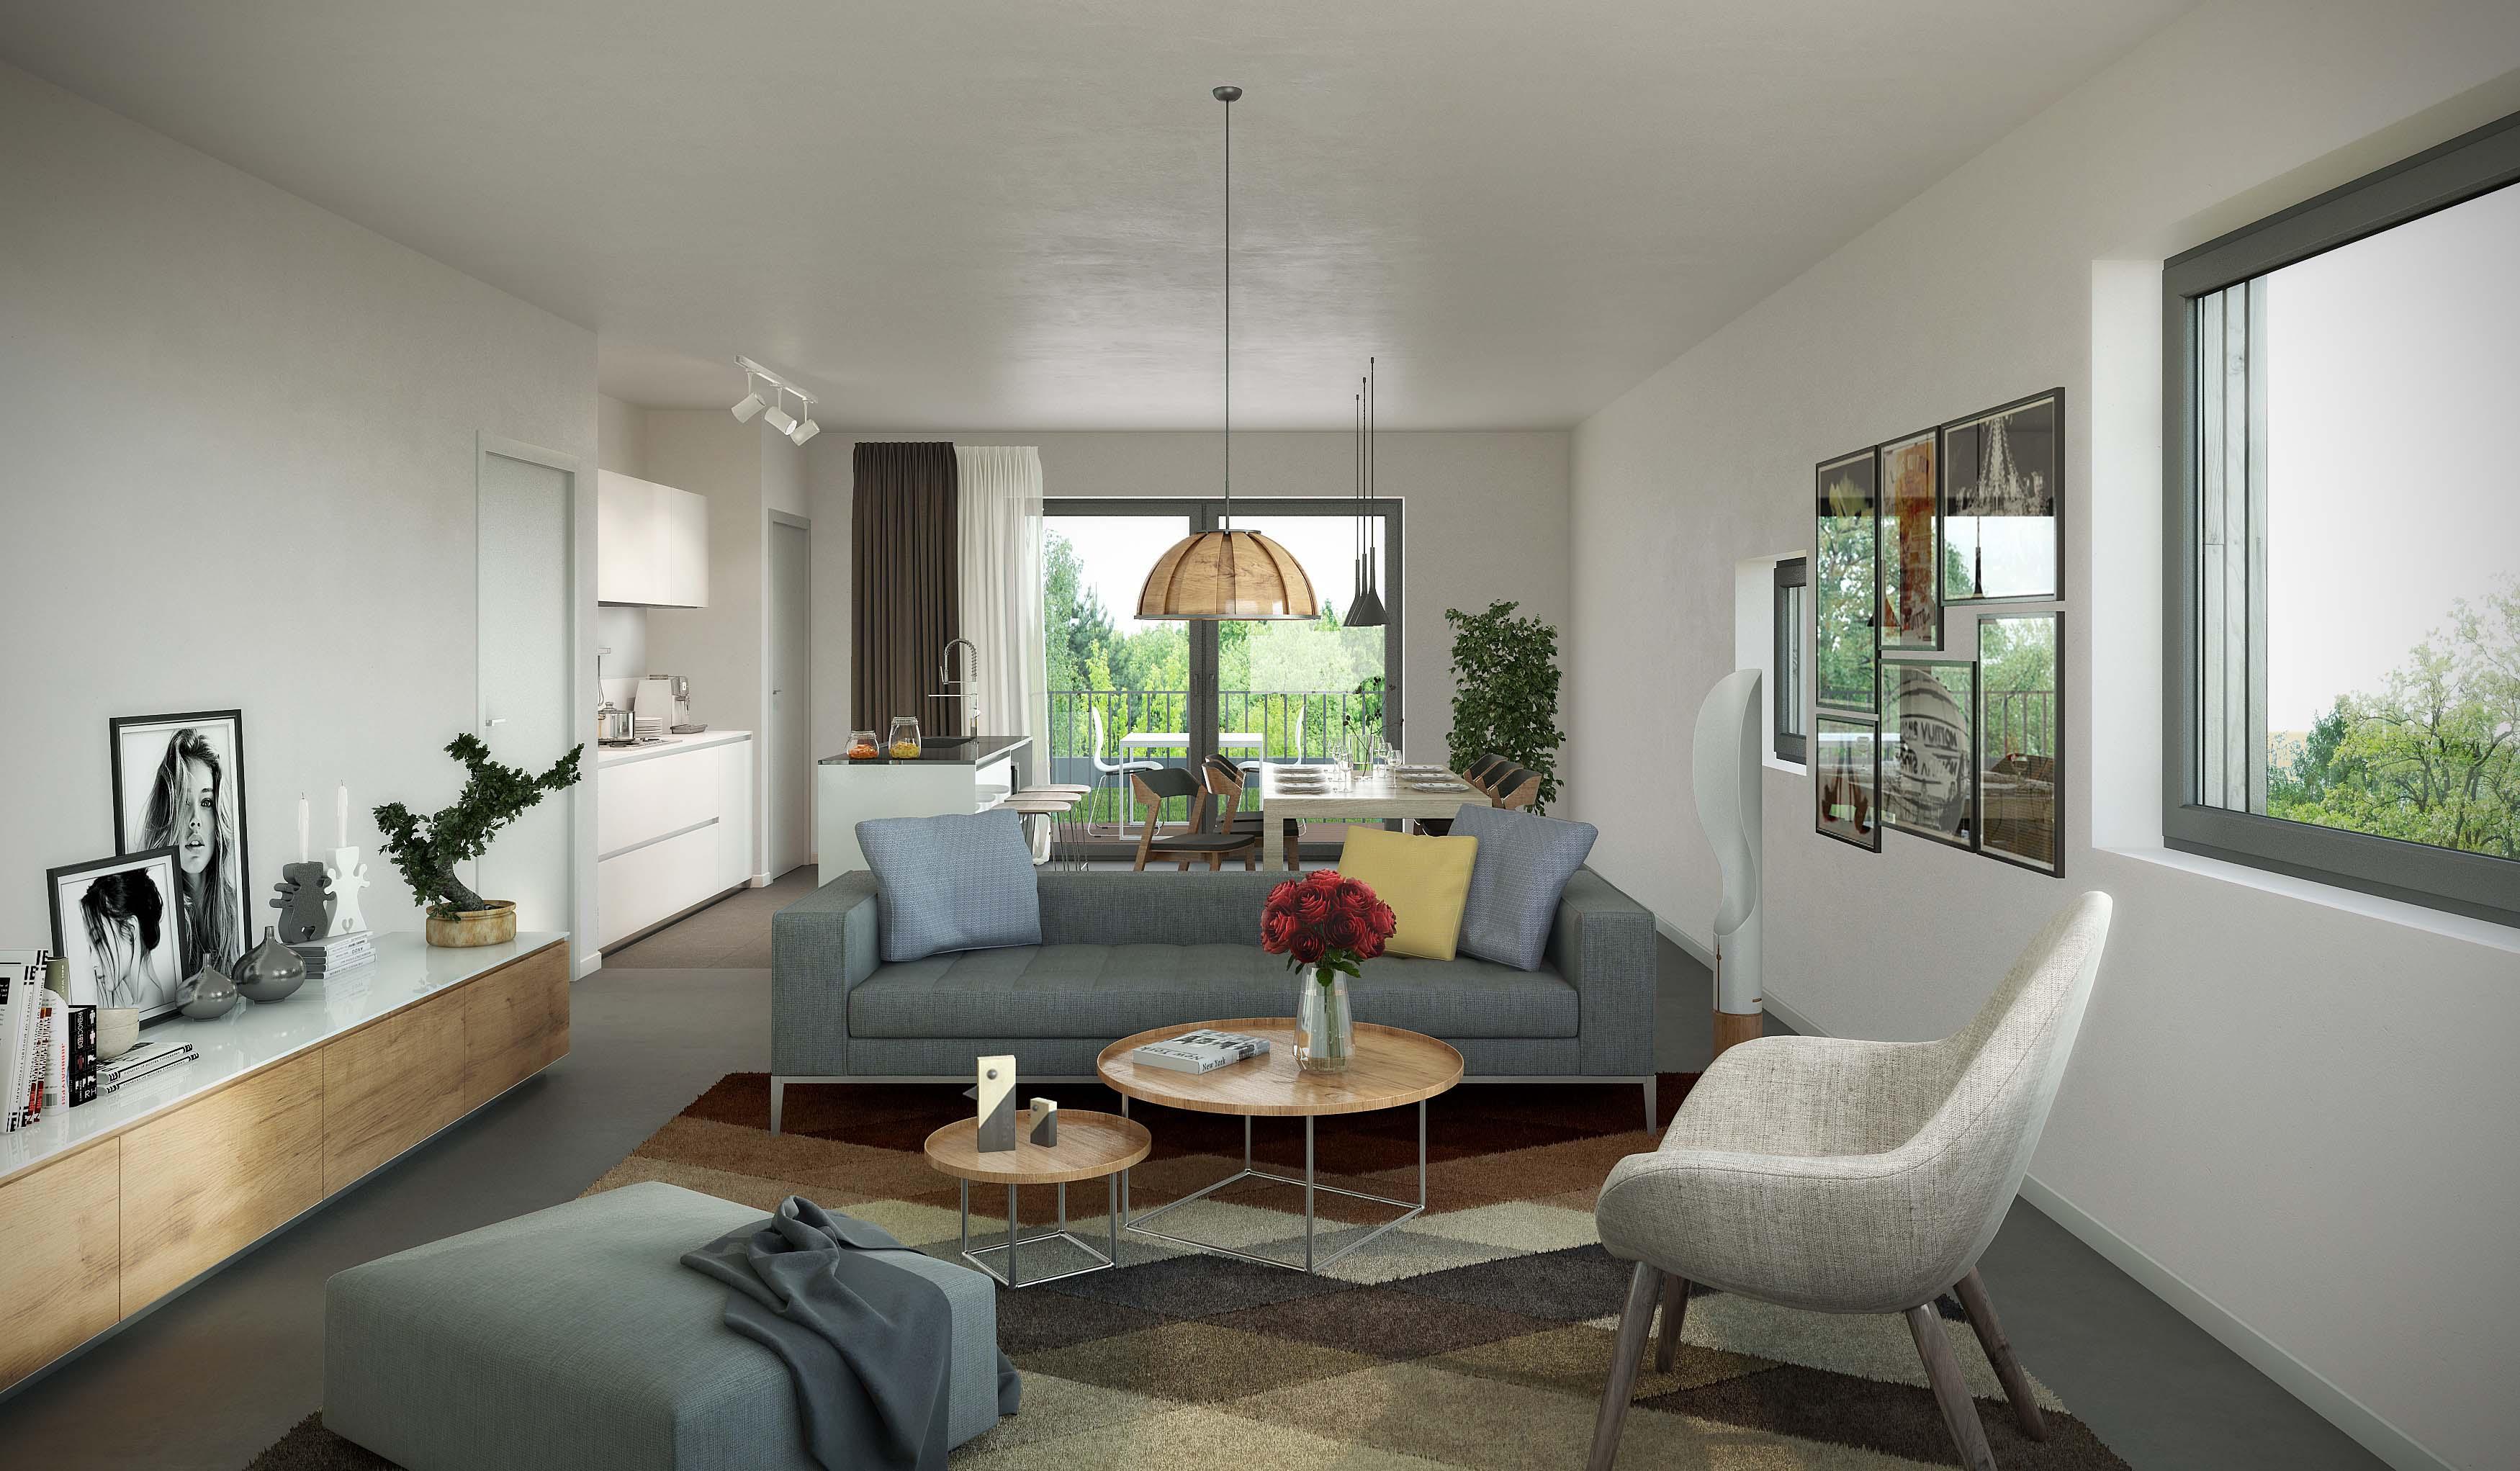 residential fineer img 3